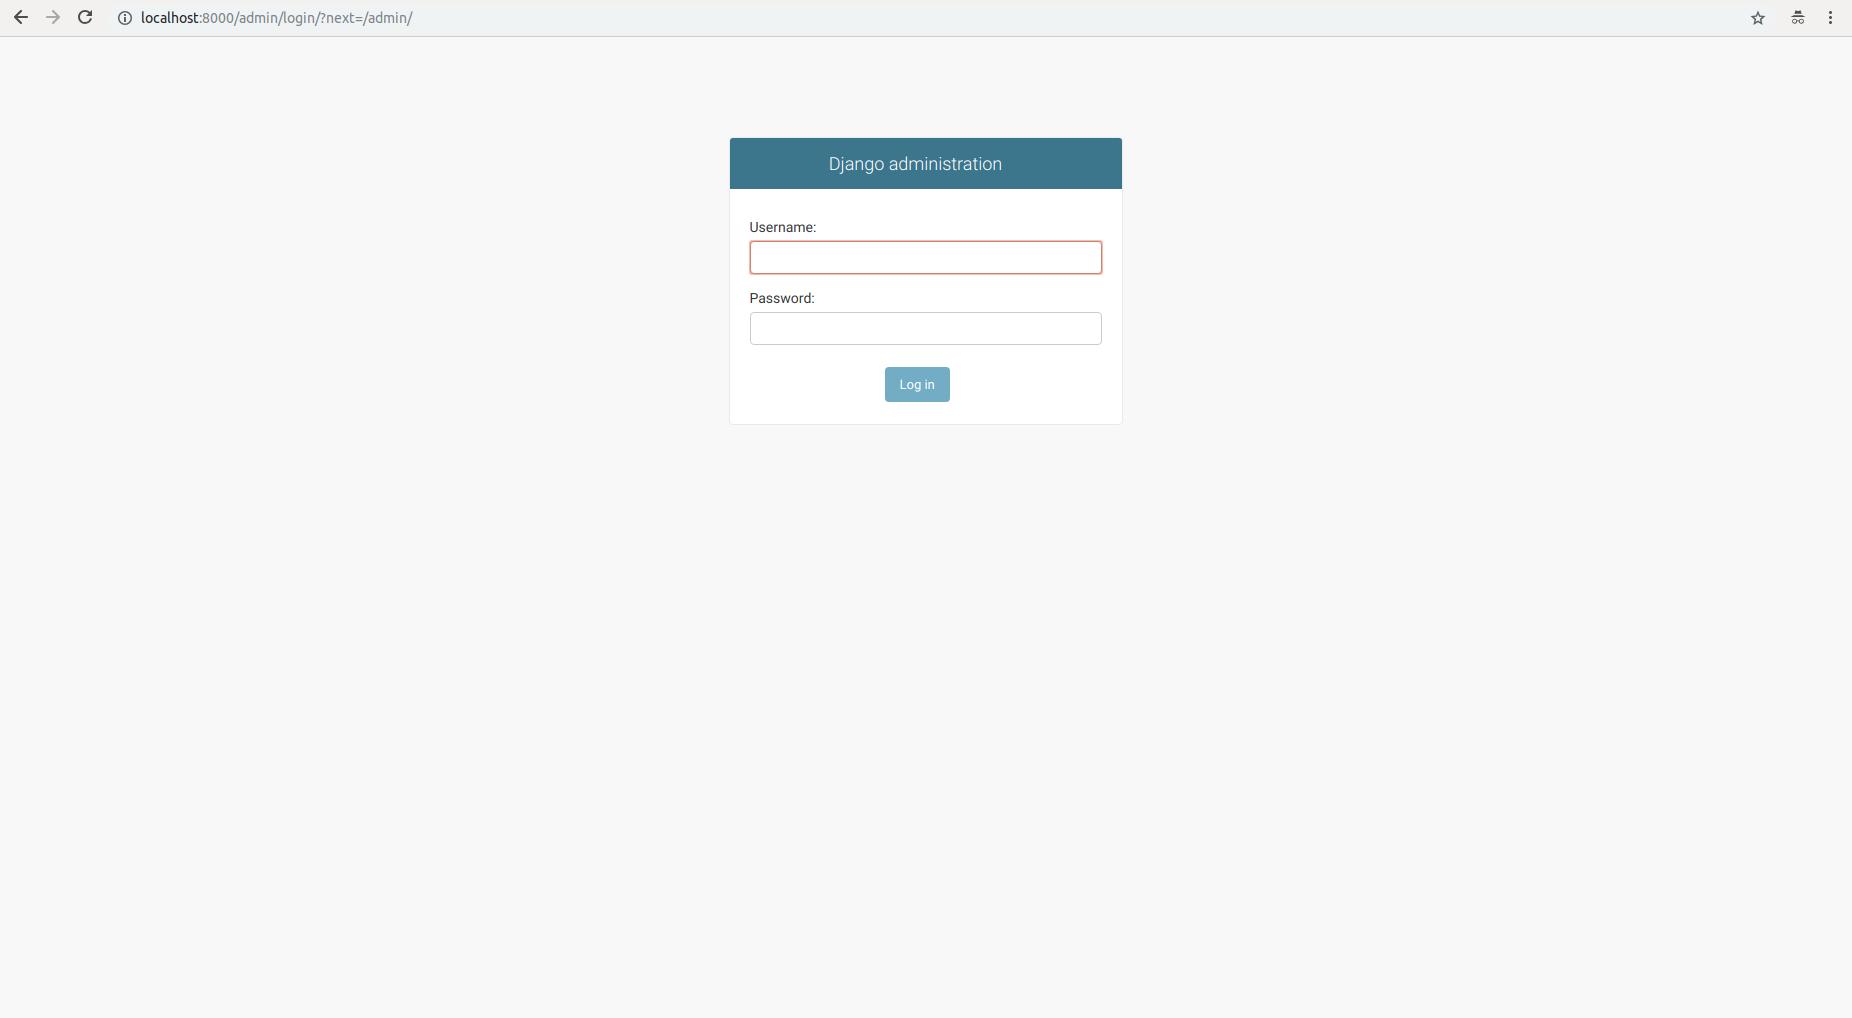 Set up the Django admin site: Configure and install the